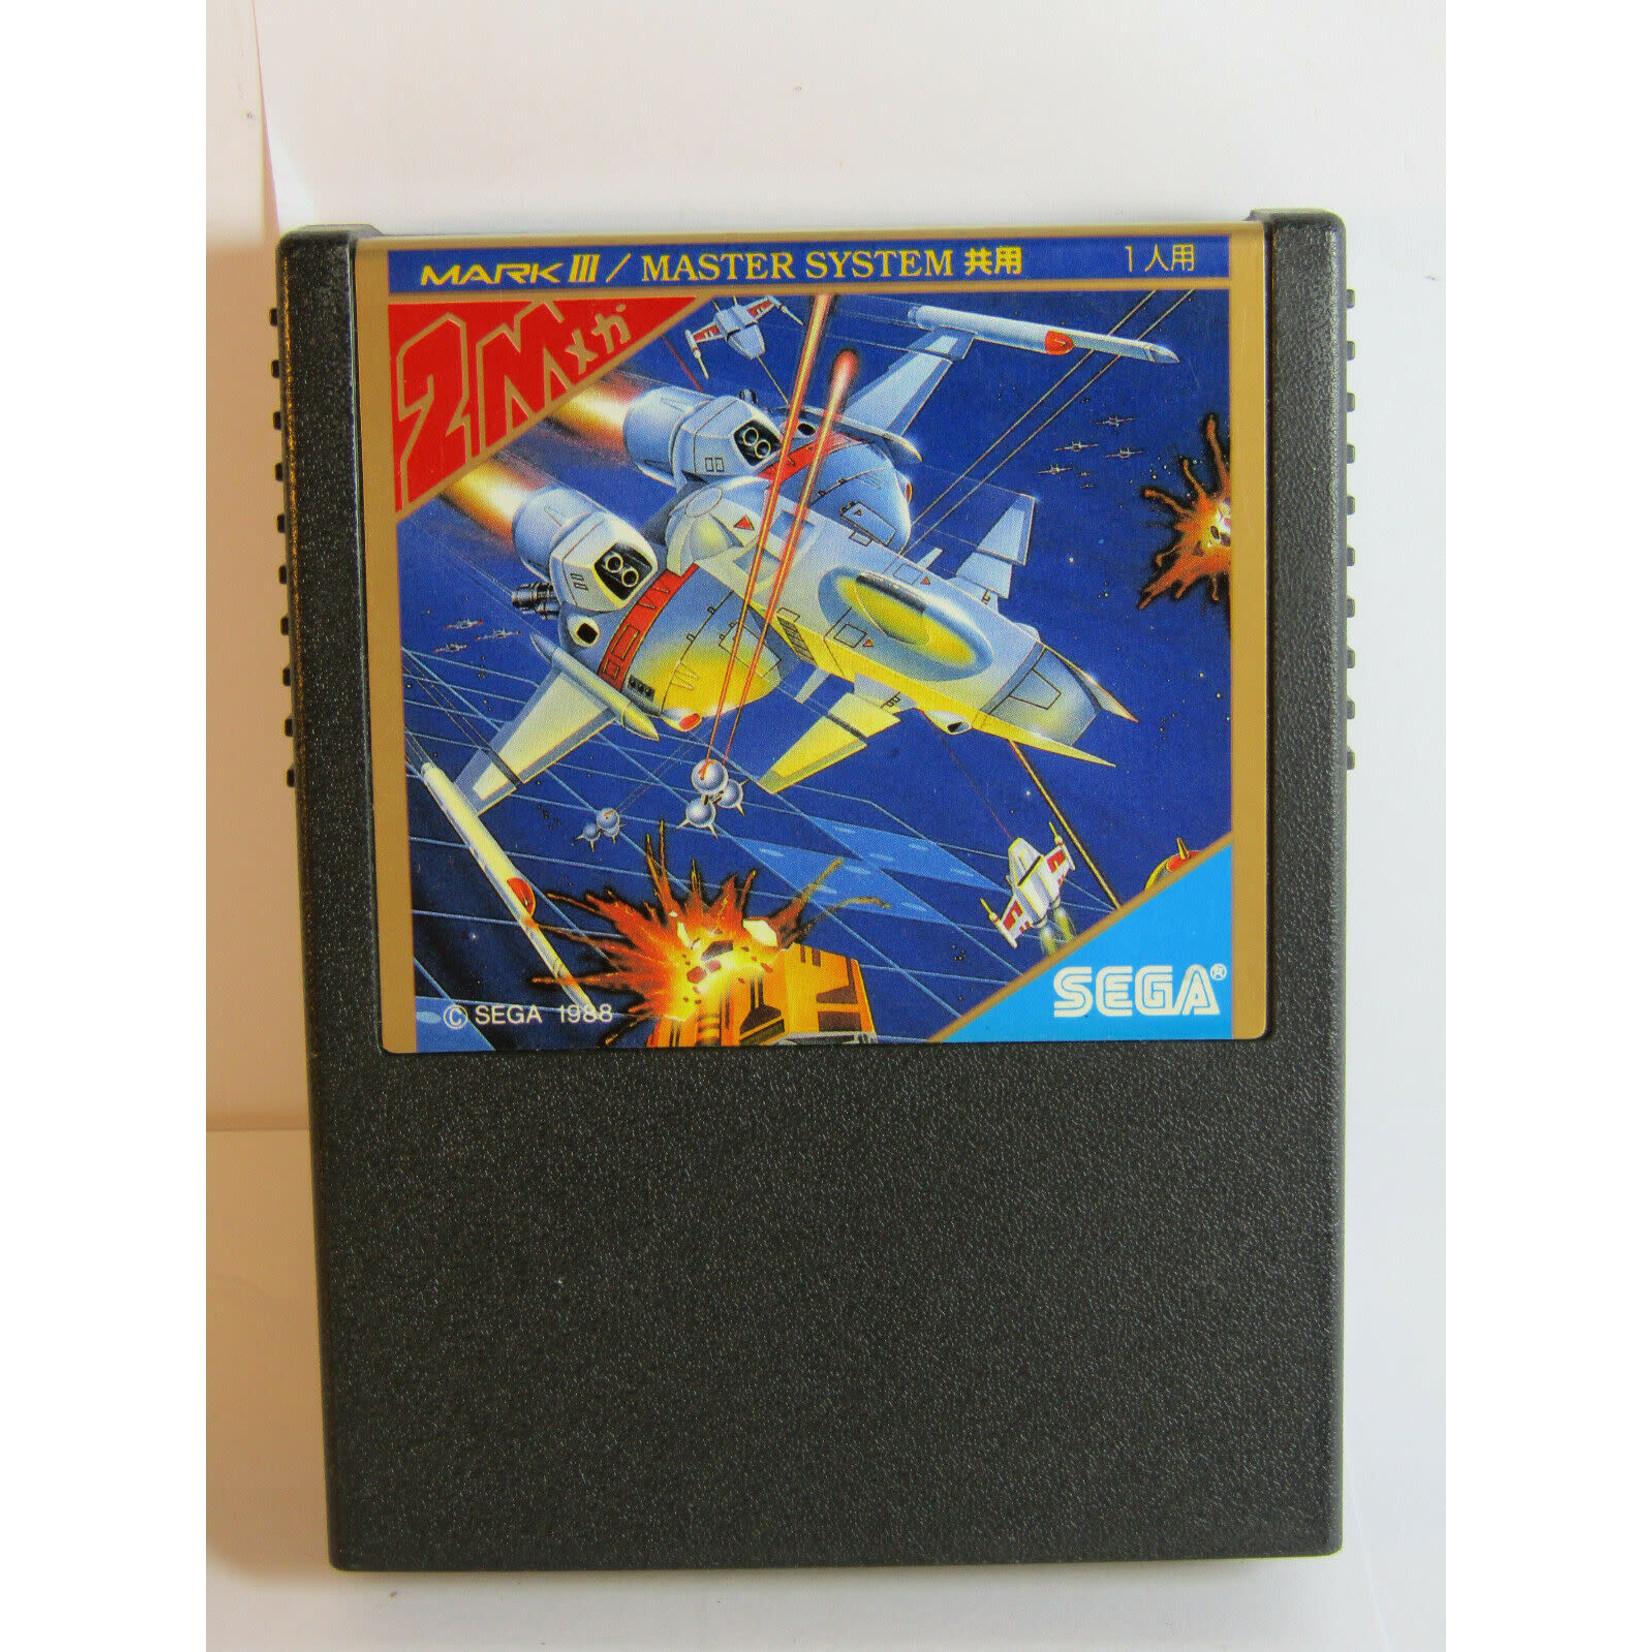 Sega Mark III Master System Blade Eagle (CART)